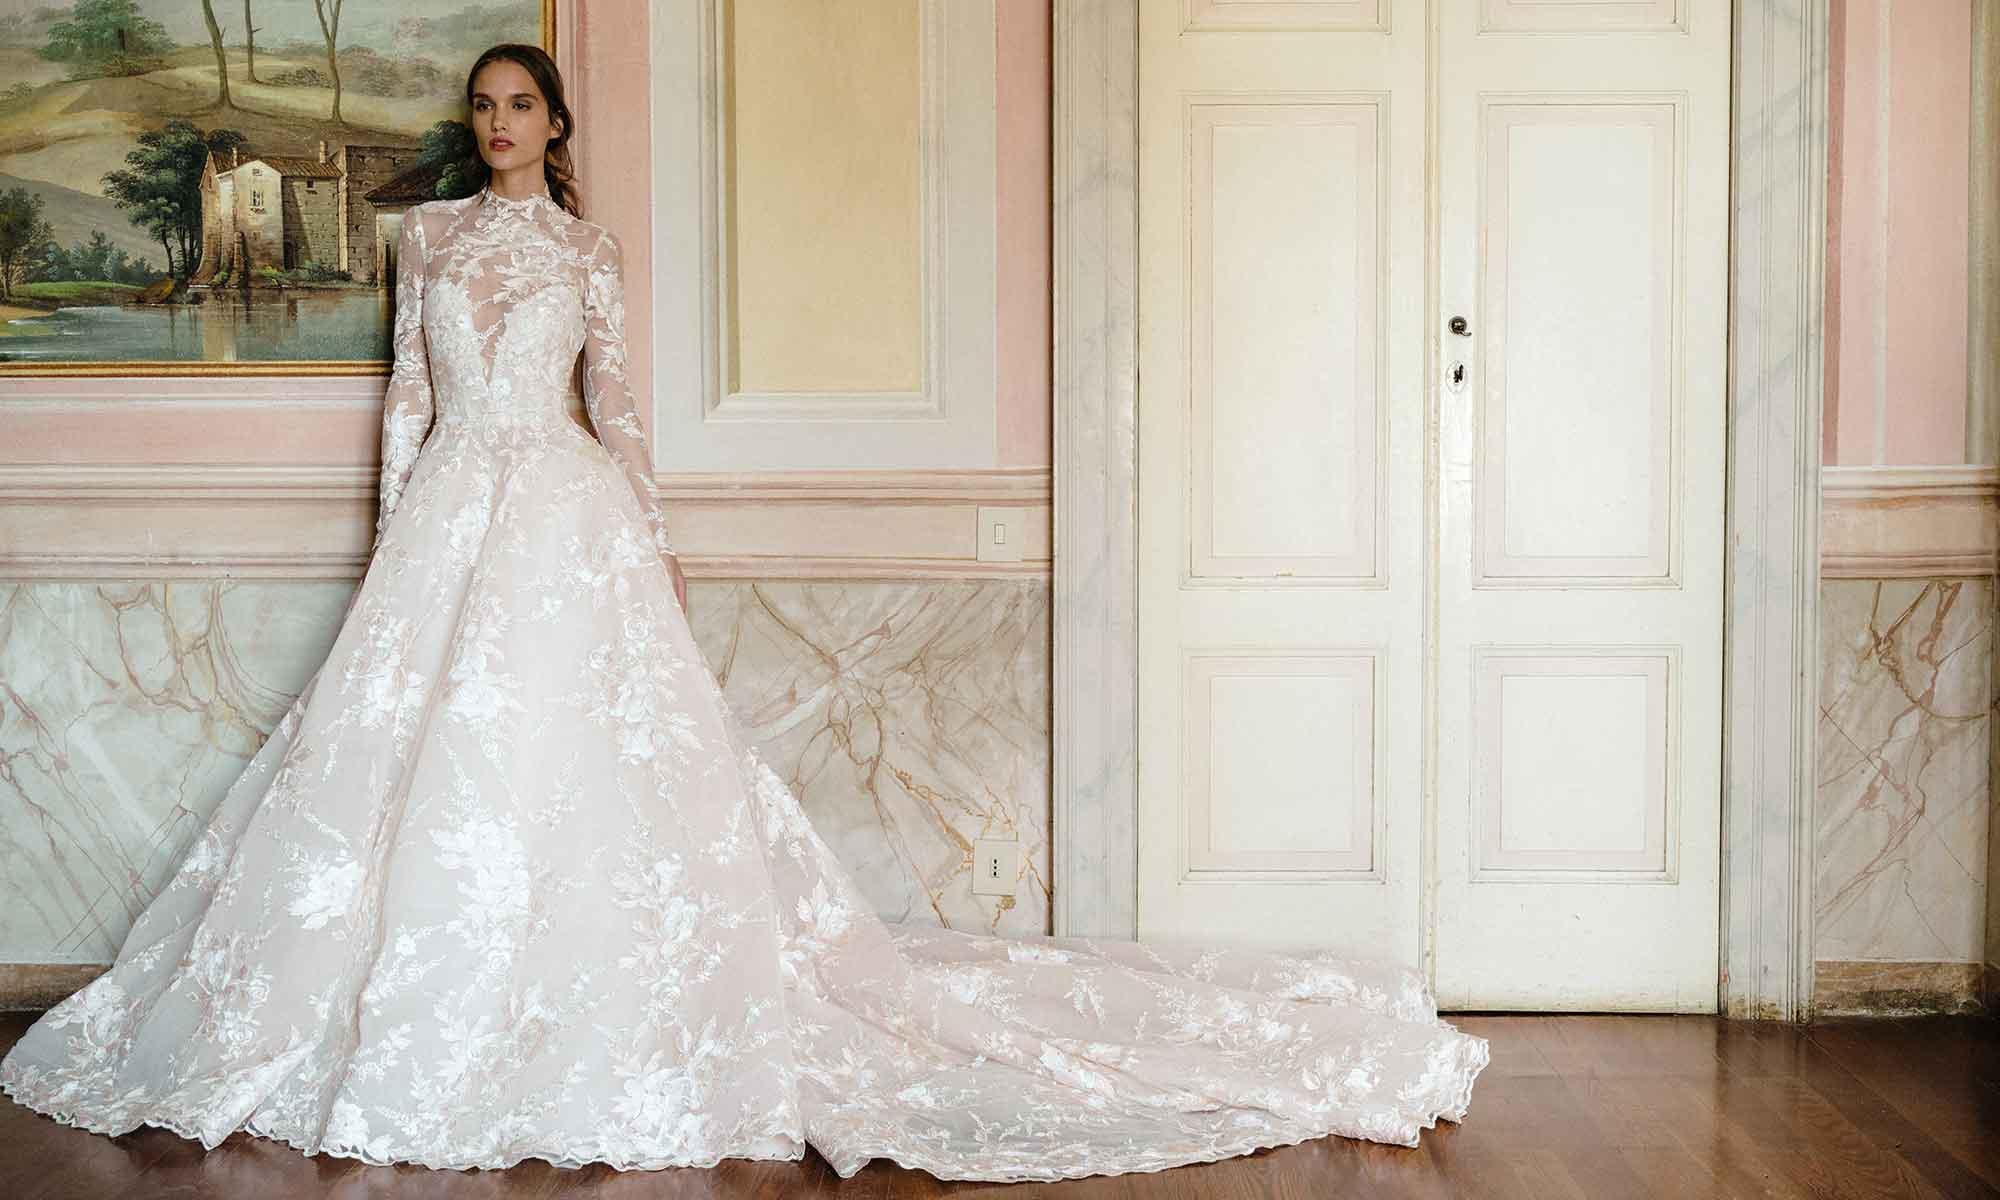 Wedding Dress Collection Monique Lhuillier Fall 2020 Wedding Blog 5 Star Wedding Directory